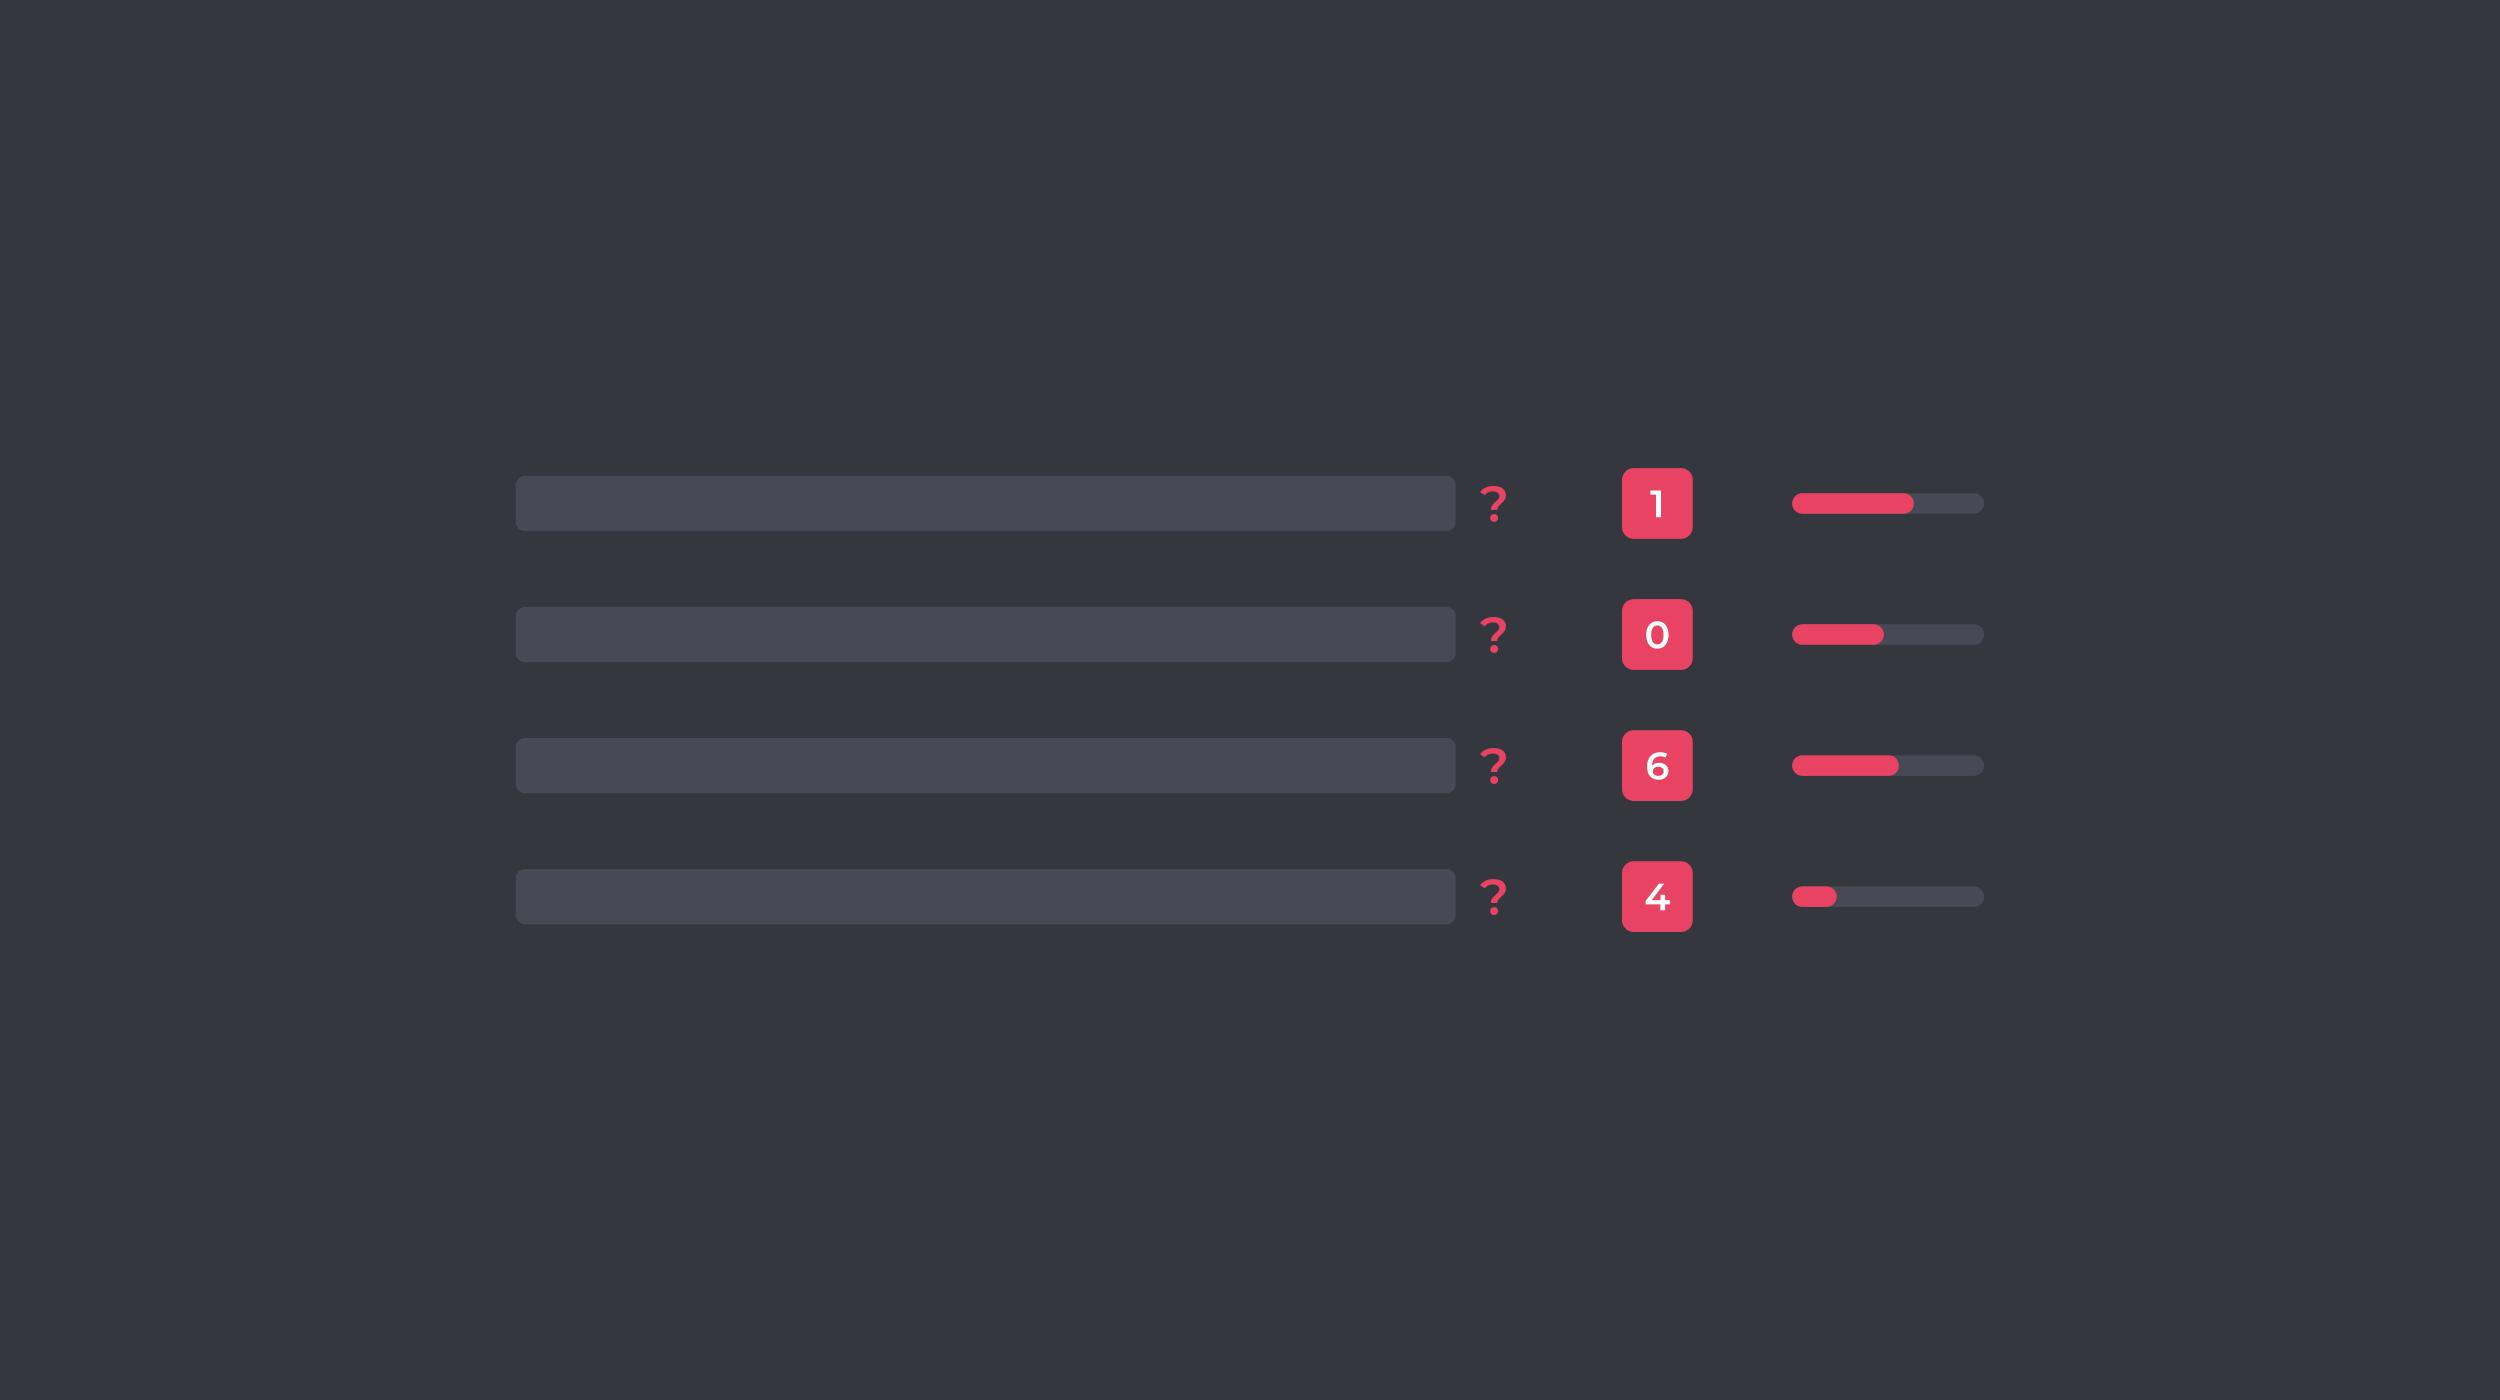 Question-Based Keywords